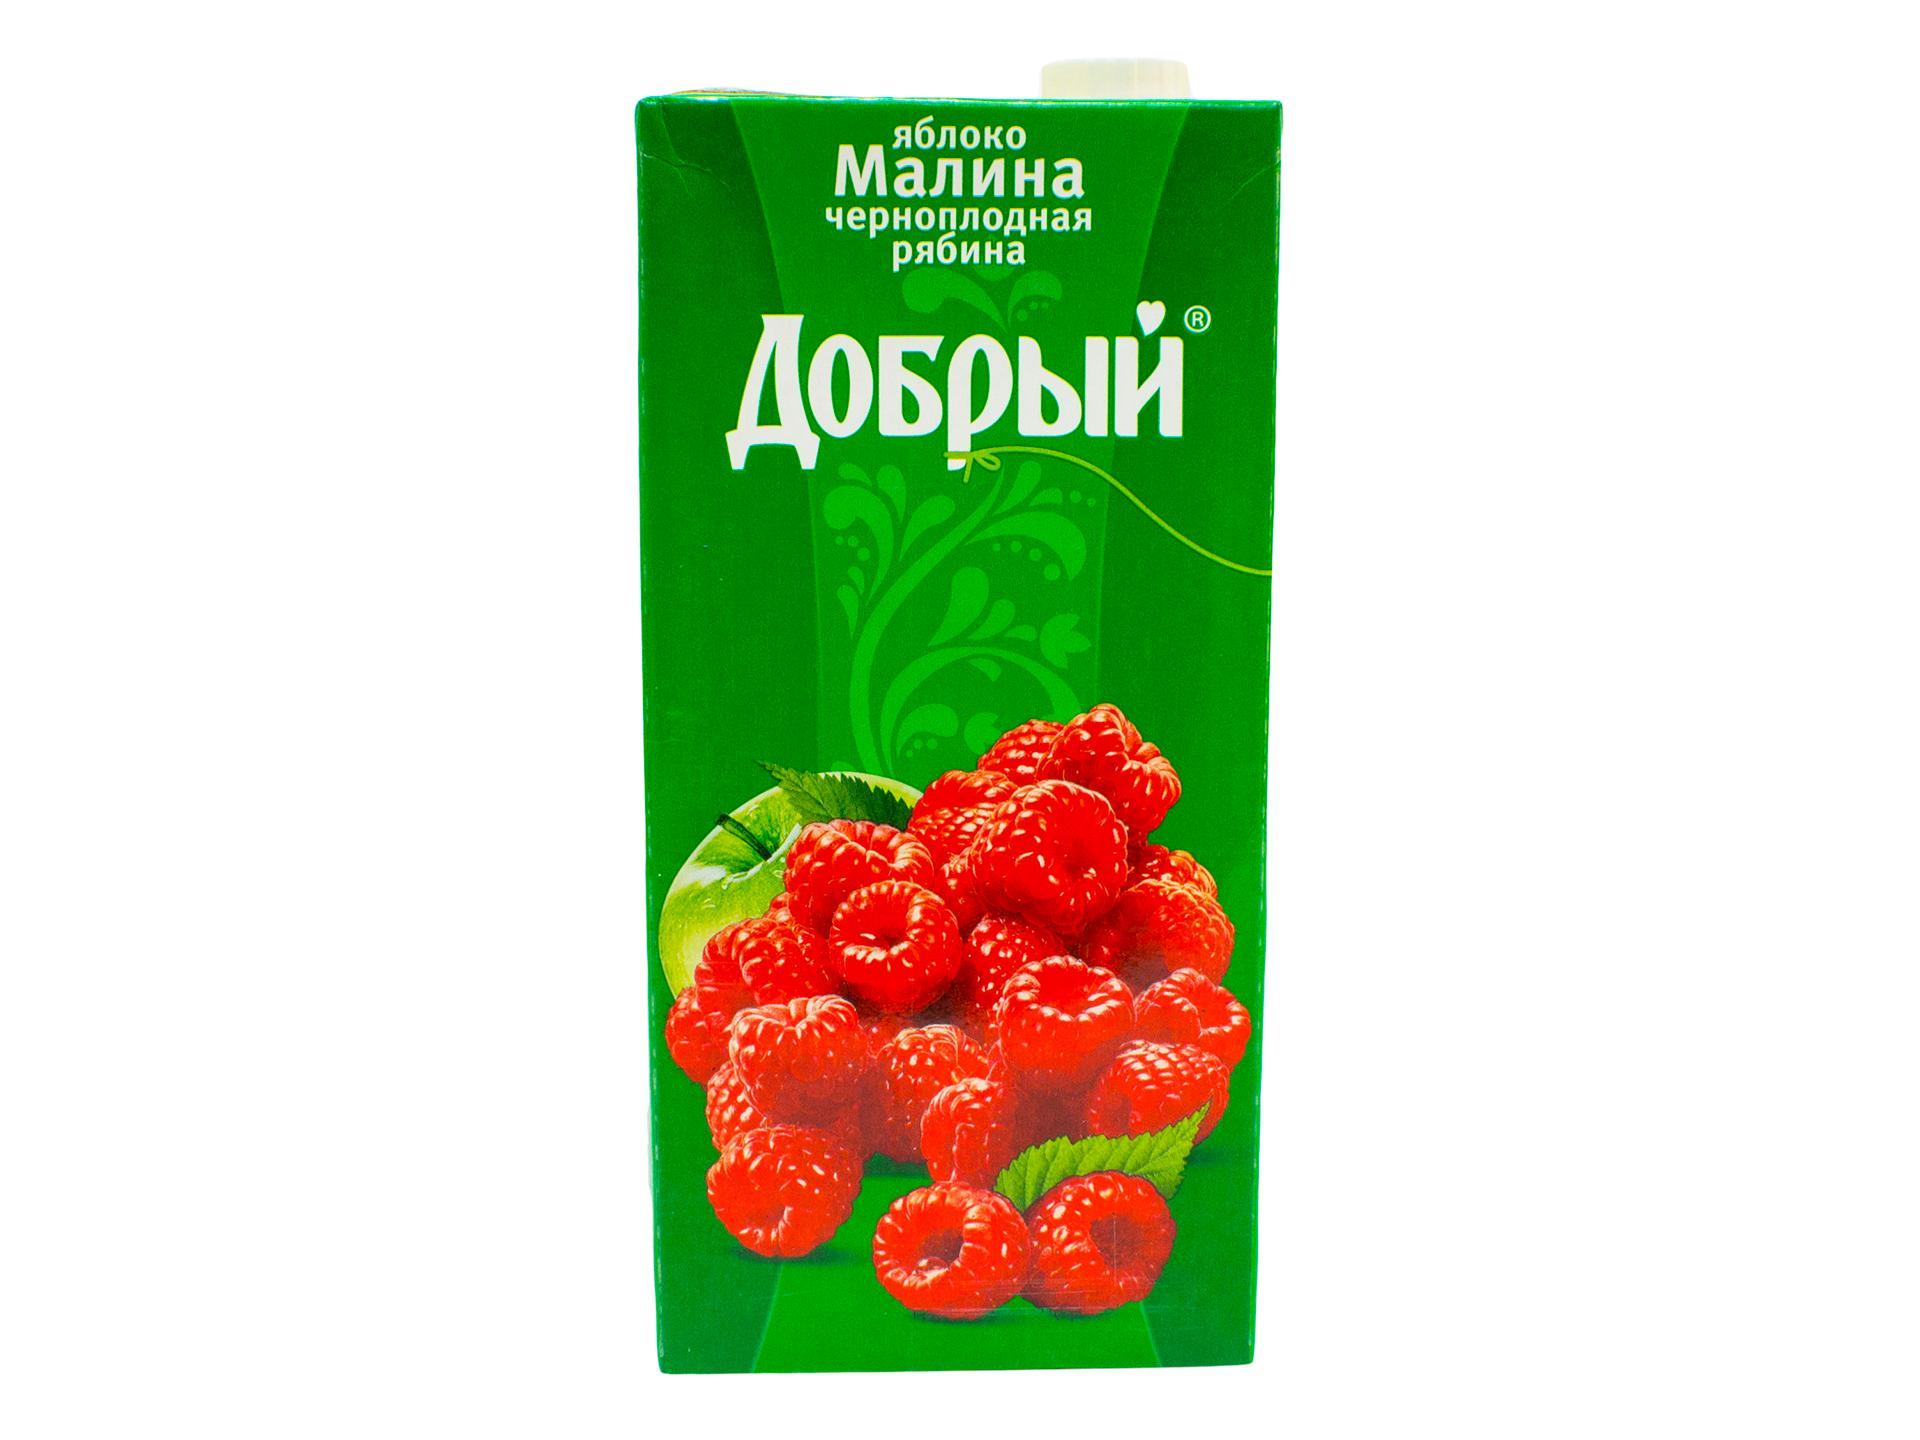 Нектар яблоко, черная рябина, малина Добрый, 2 л., Тетра-пак